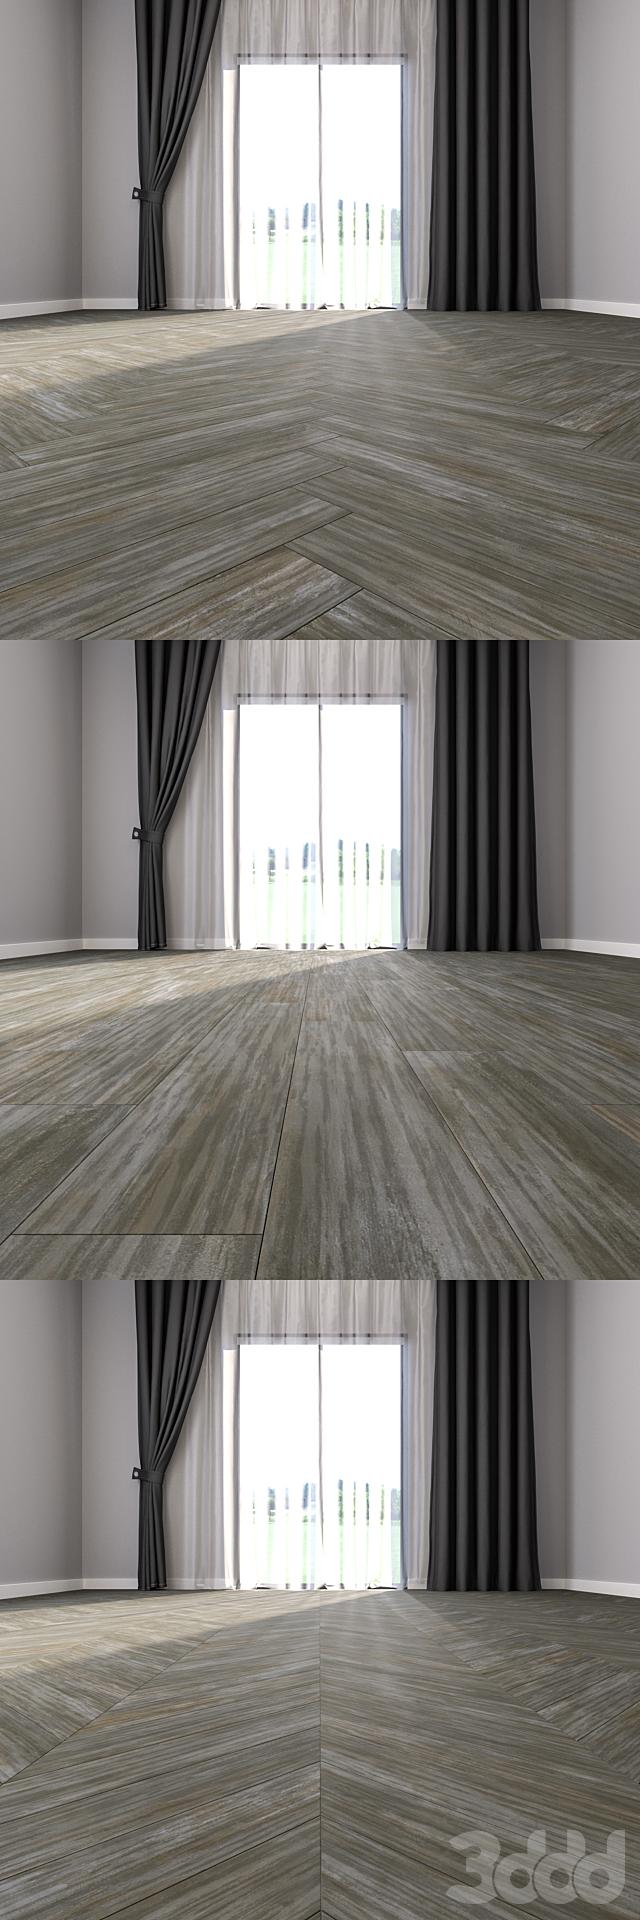 Parquet Floor Set 22